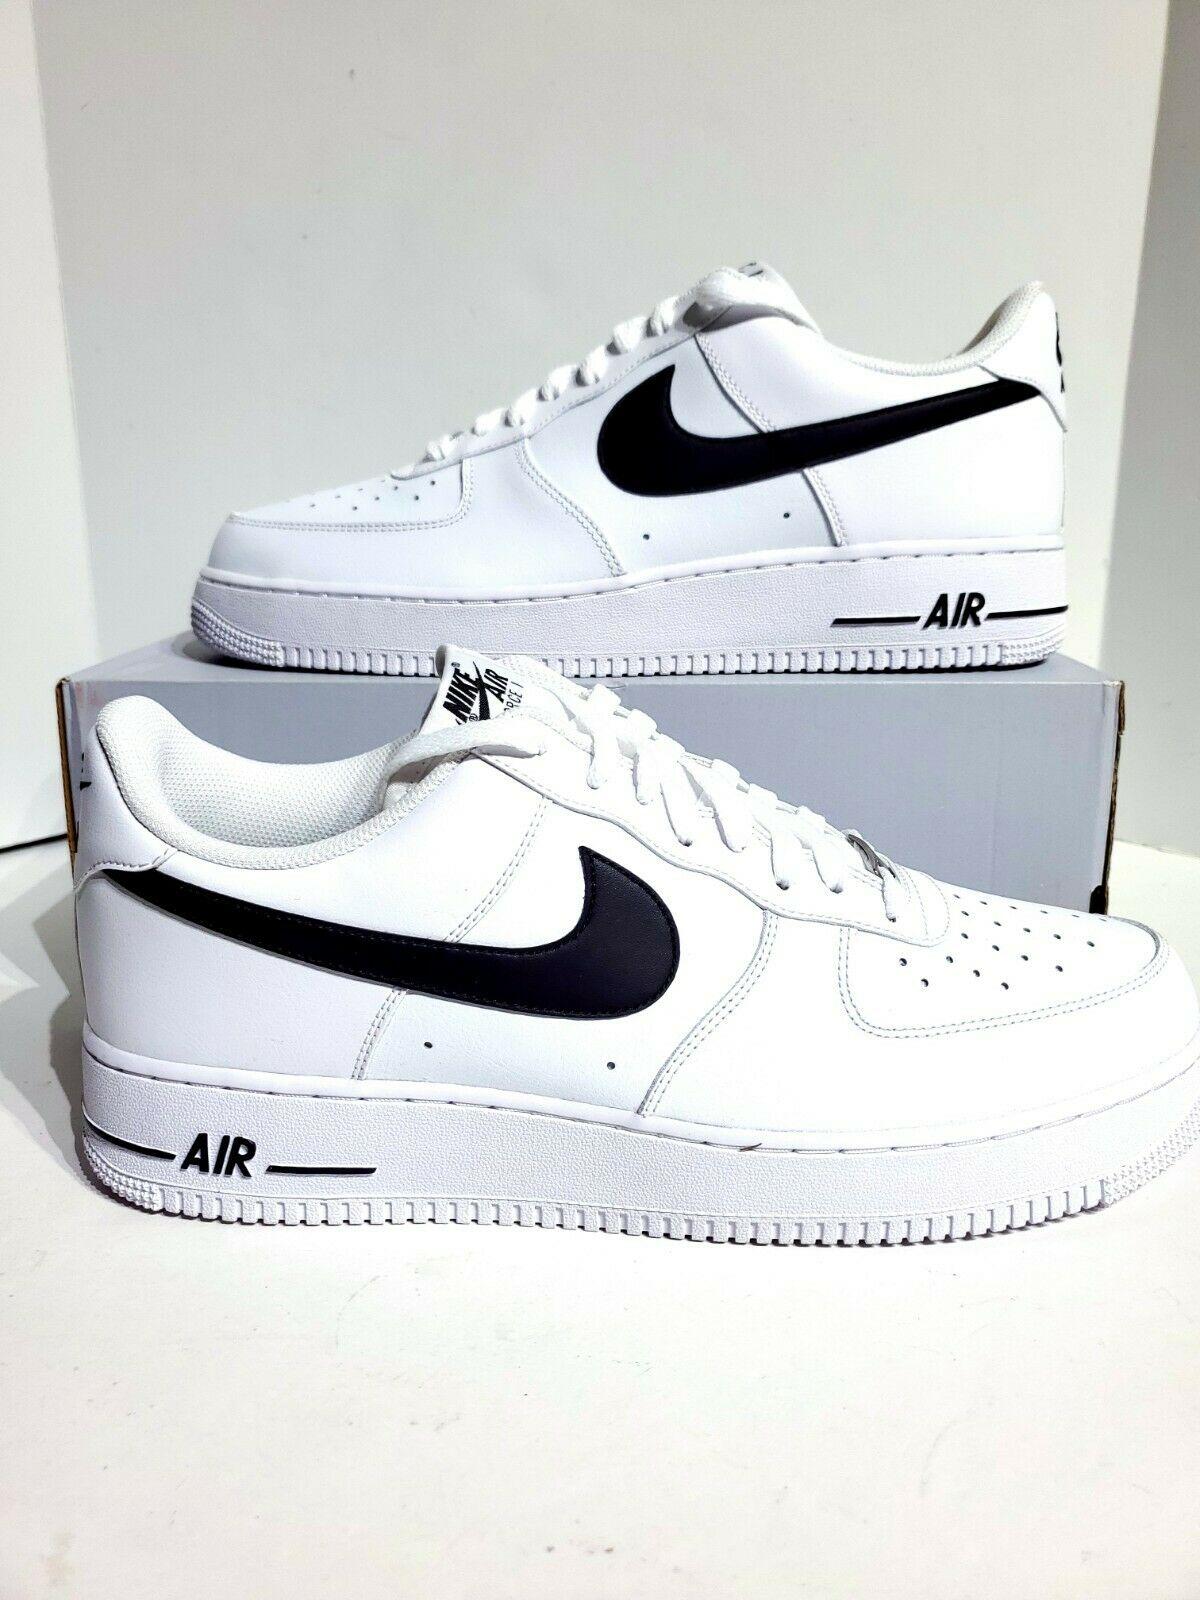 Nike Air Force 1 Low White Black 2020